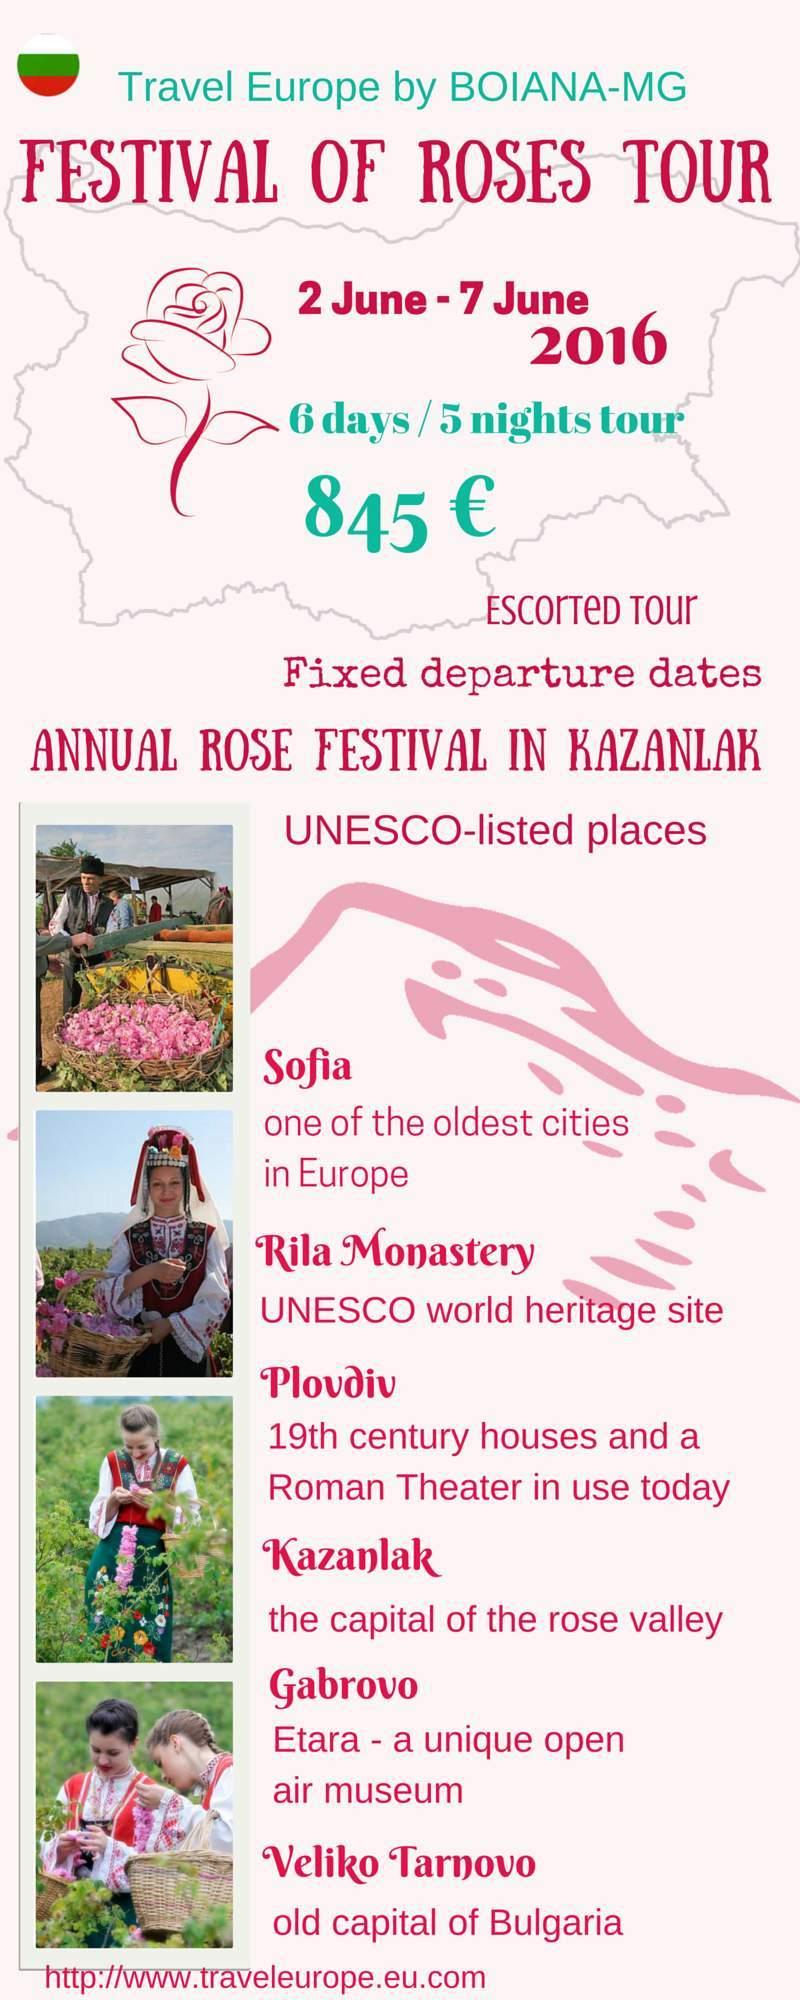 Festival of Roses Tour